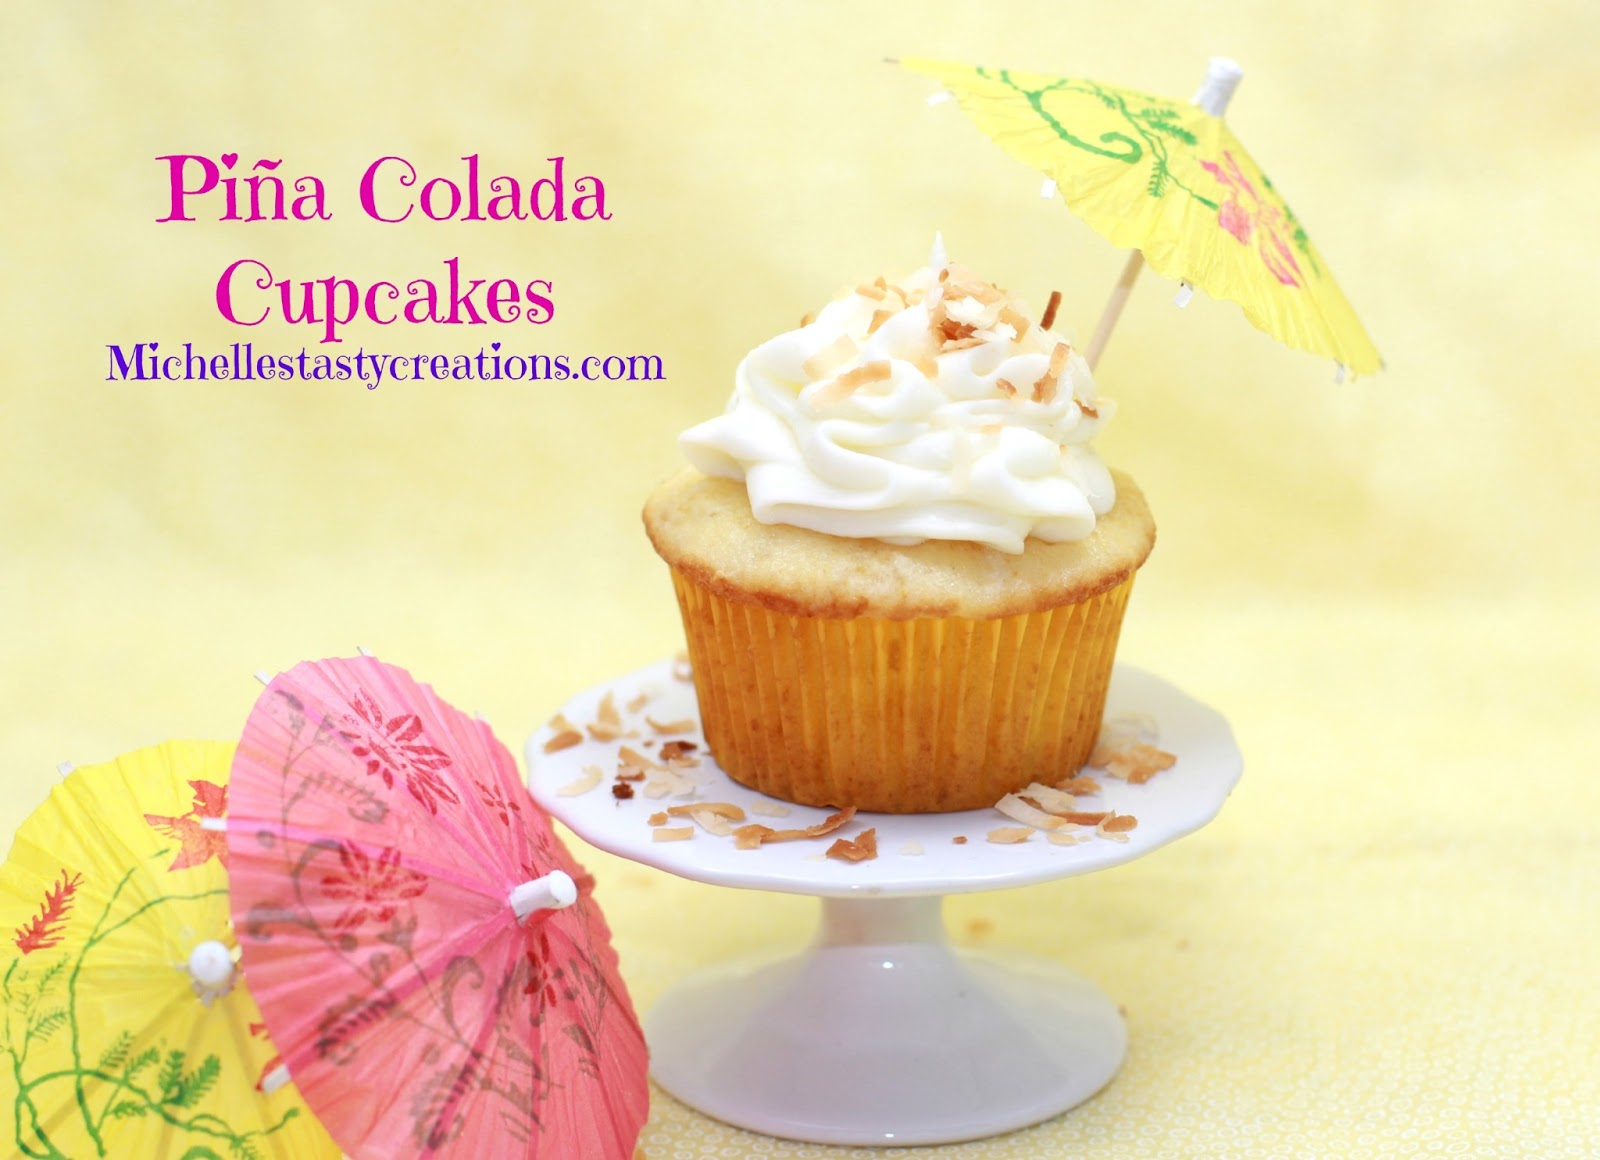 Michelle's Tasty Creations: Piña Colada Cupcakes